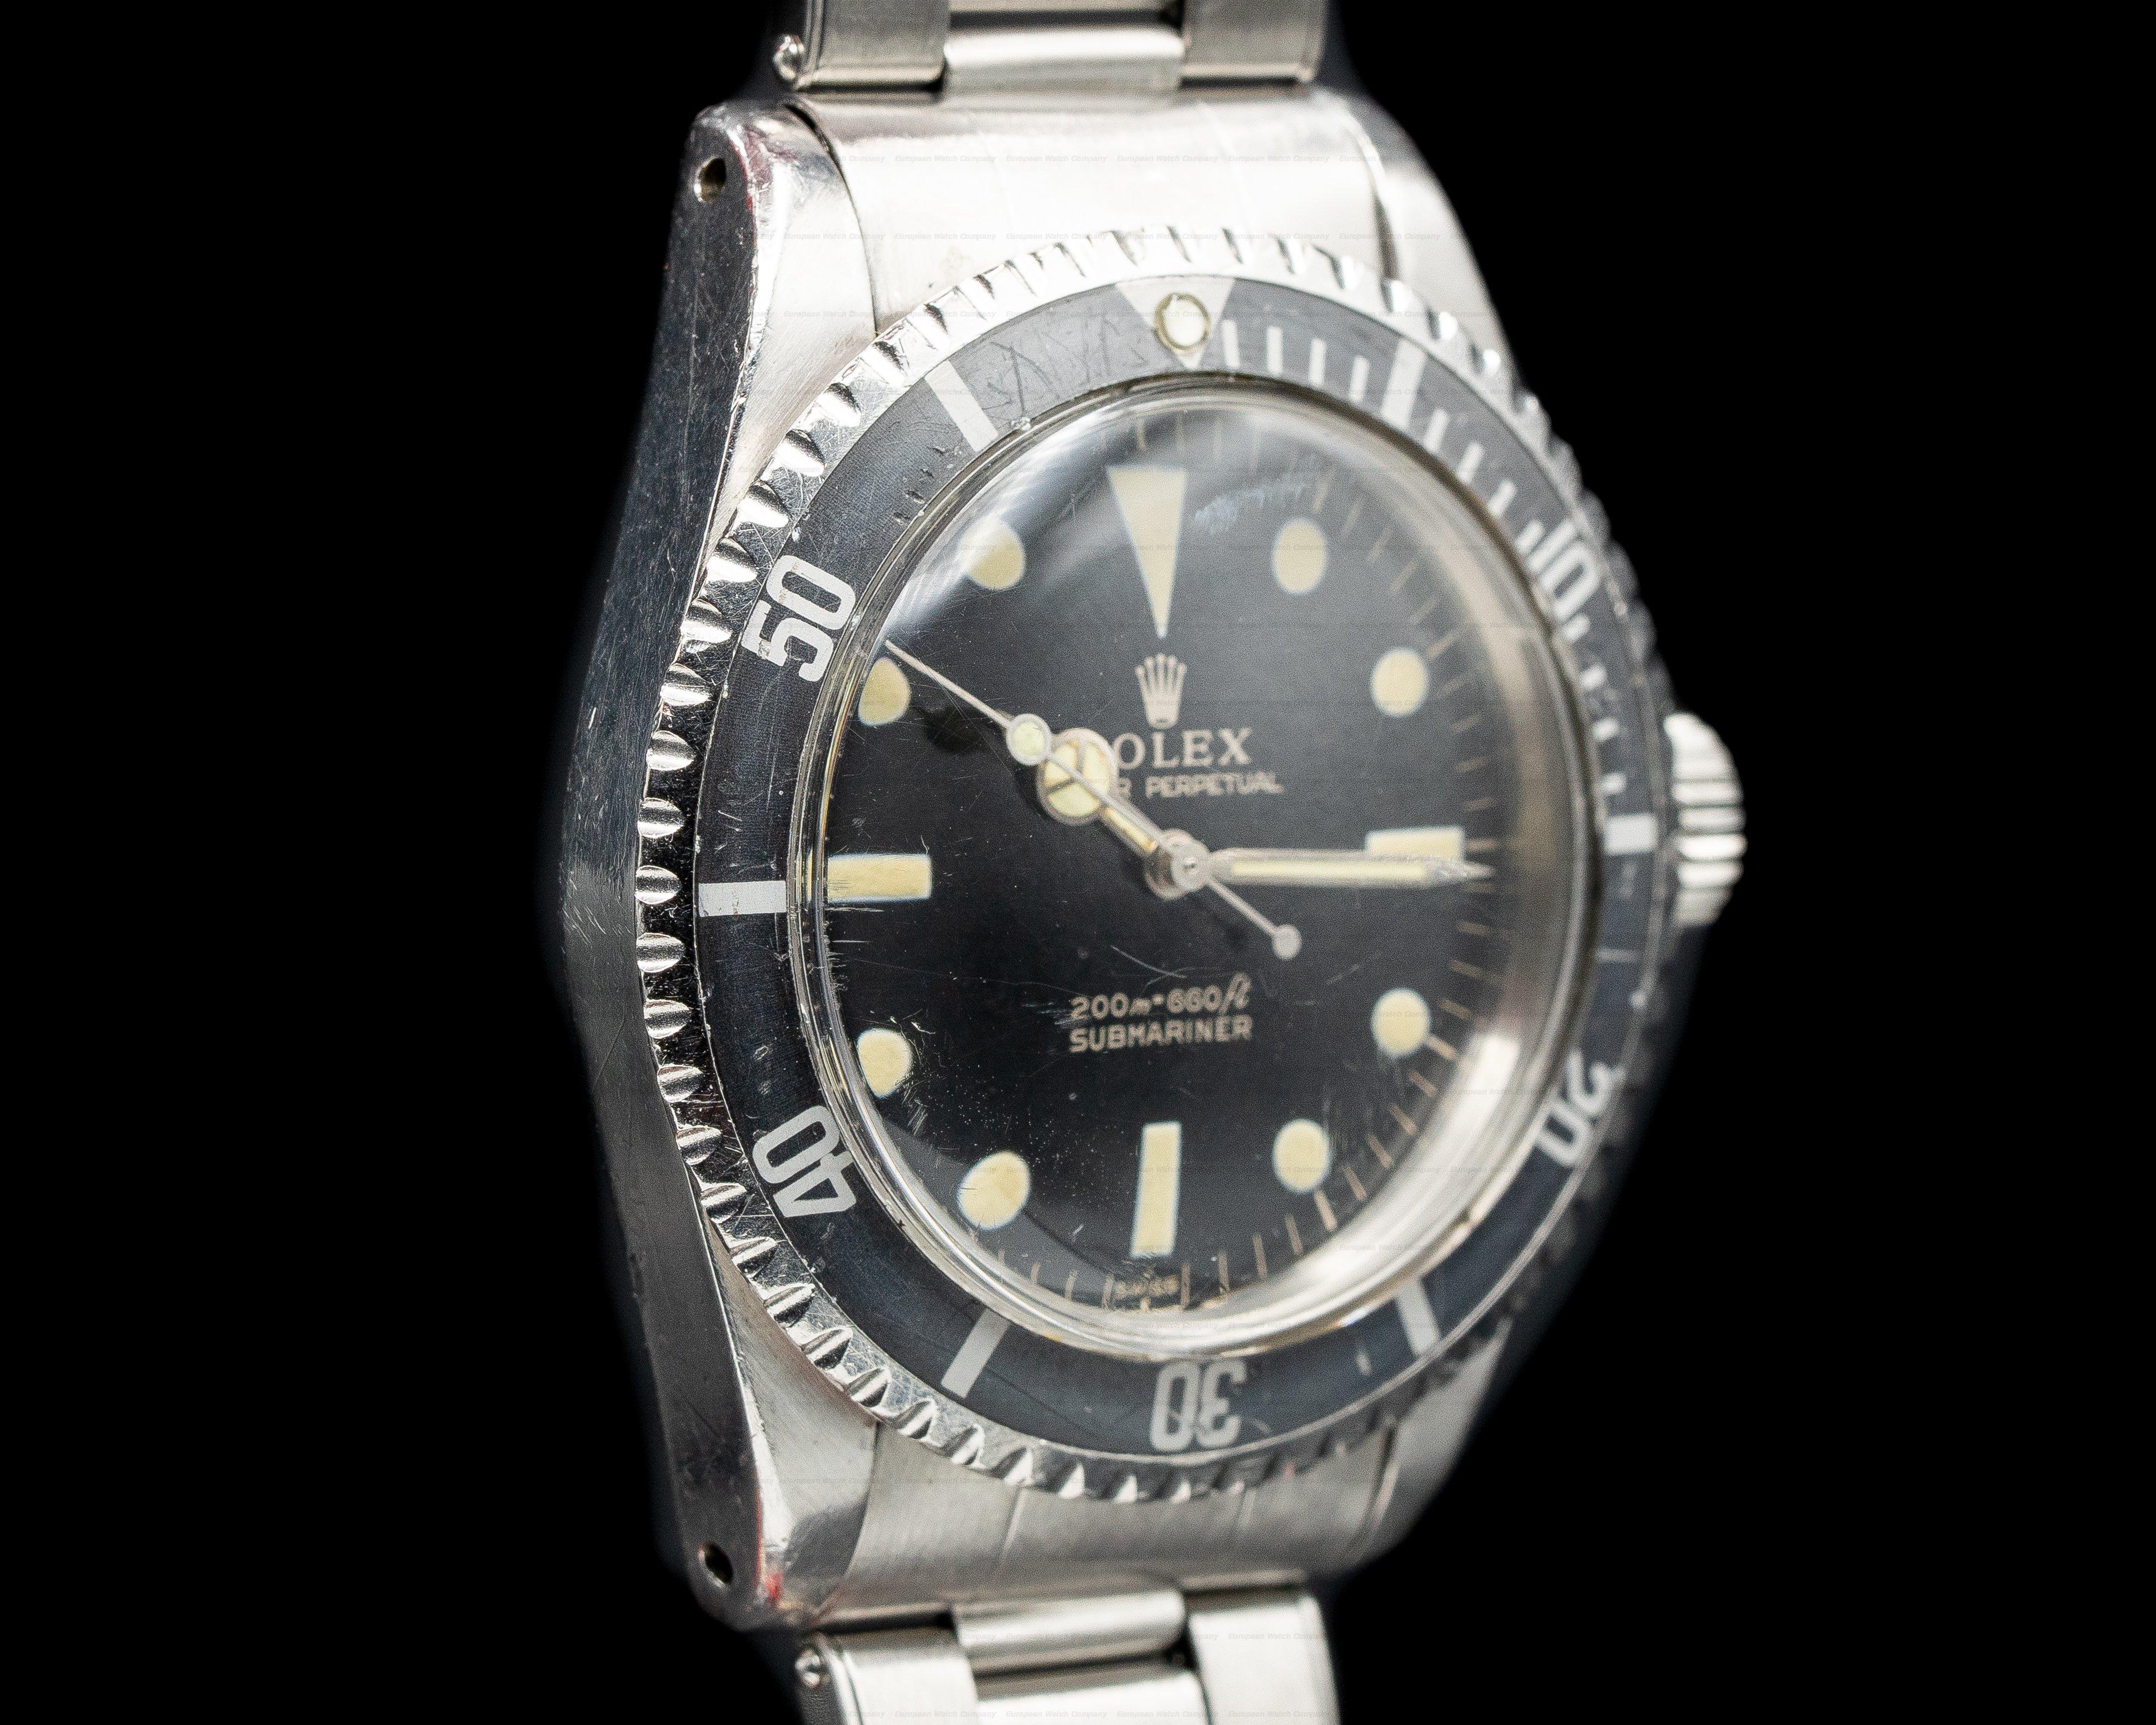 Rolex 5513 Gilt Gilt 5513 Submariner Glossy NICE Circa 1964